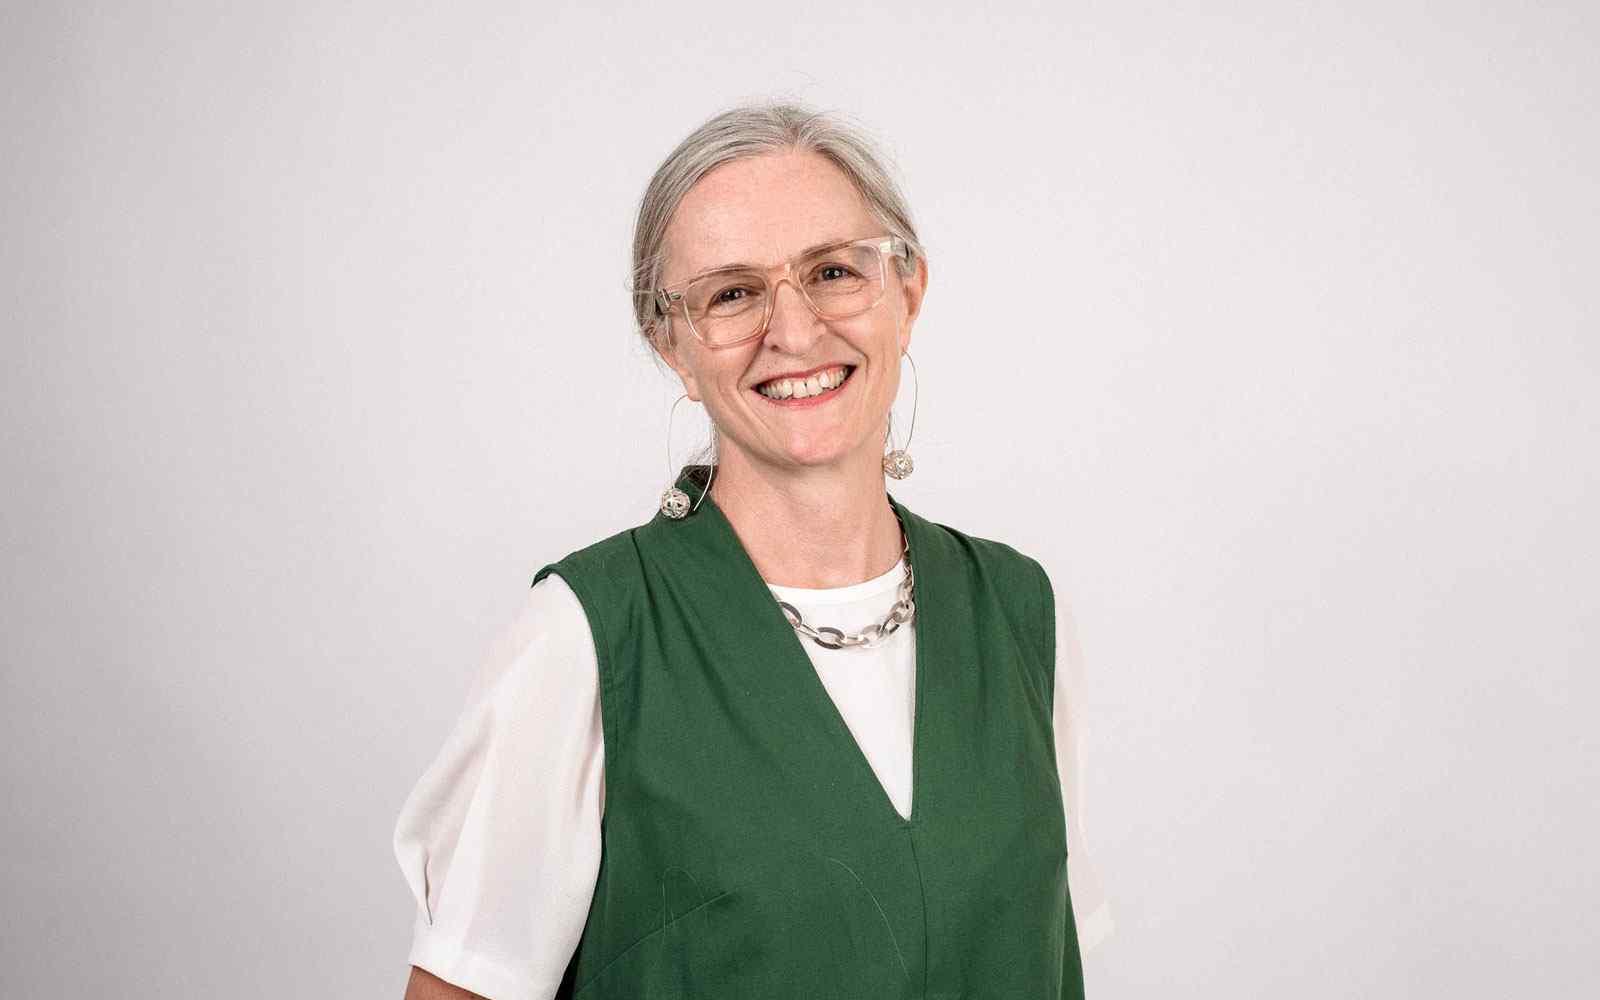 Senior Lecturer and governor Susan Orr